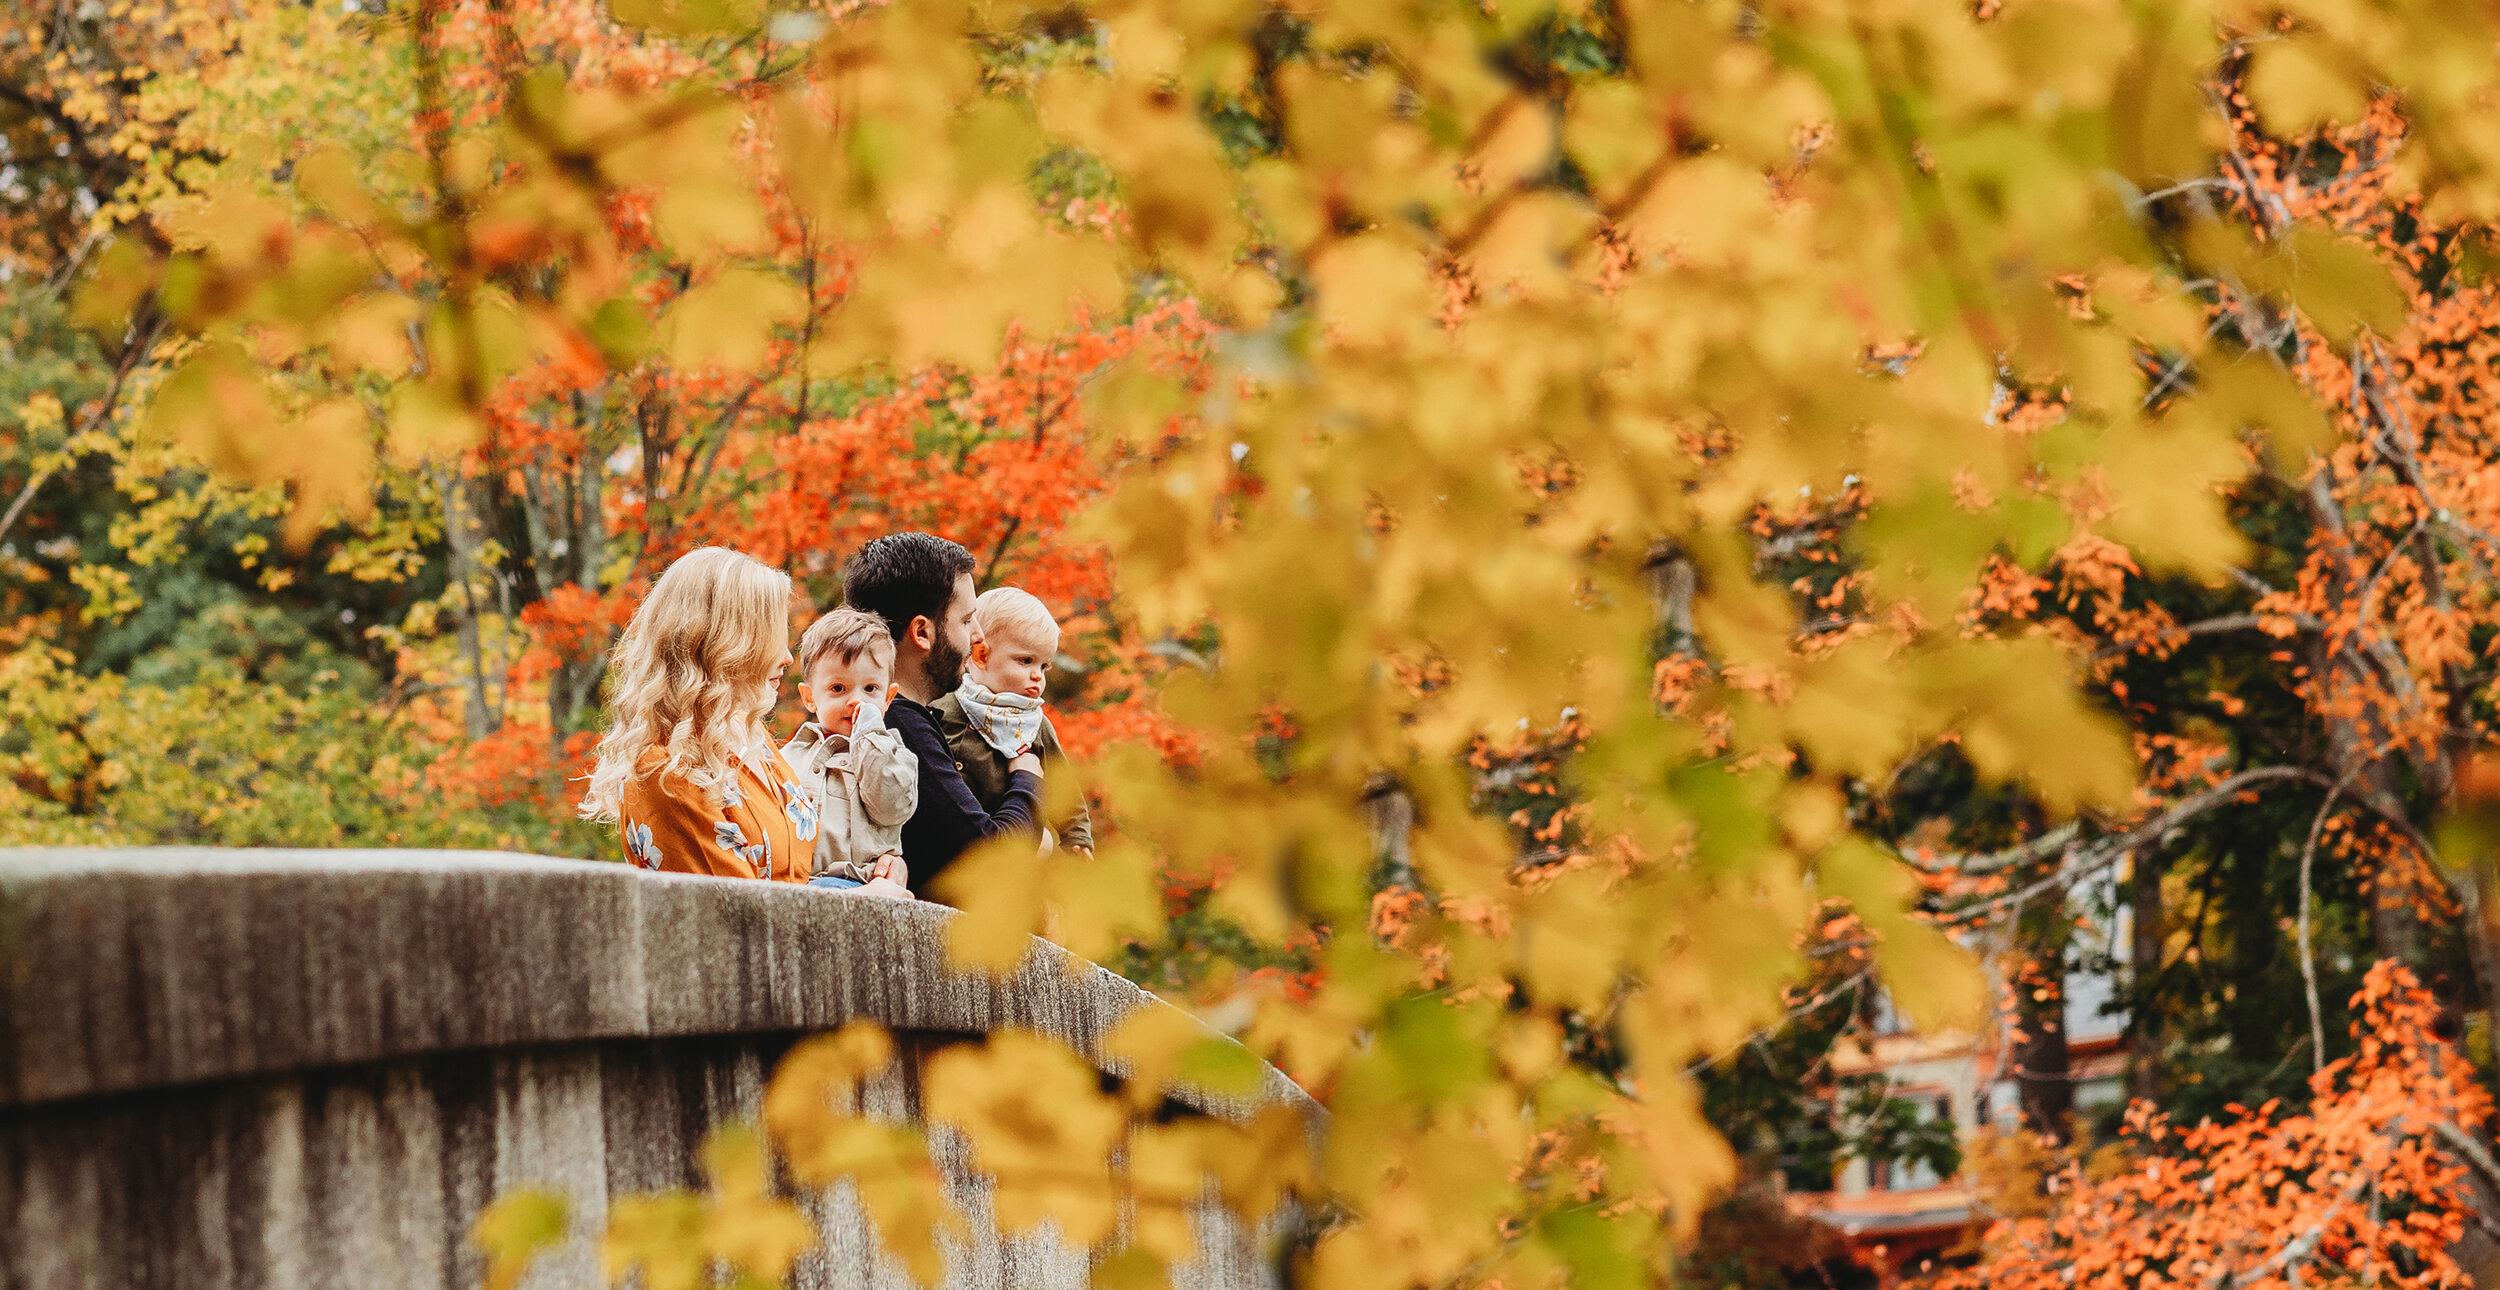 joyleducphotography-bostonnfamilyphotographer-lifestyleportraiture-25.jpg